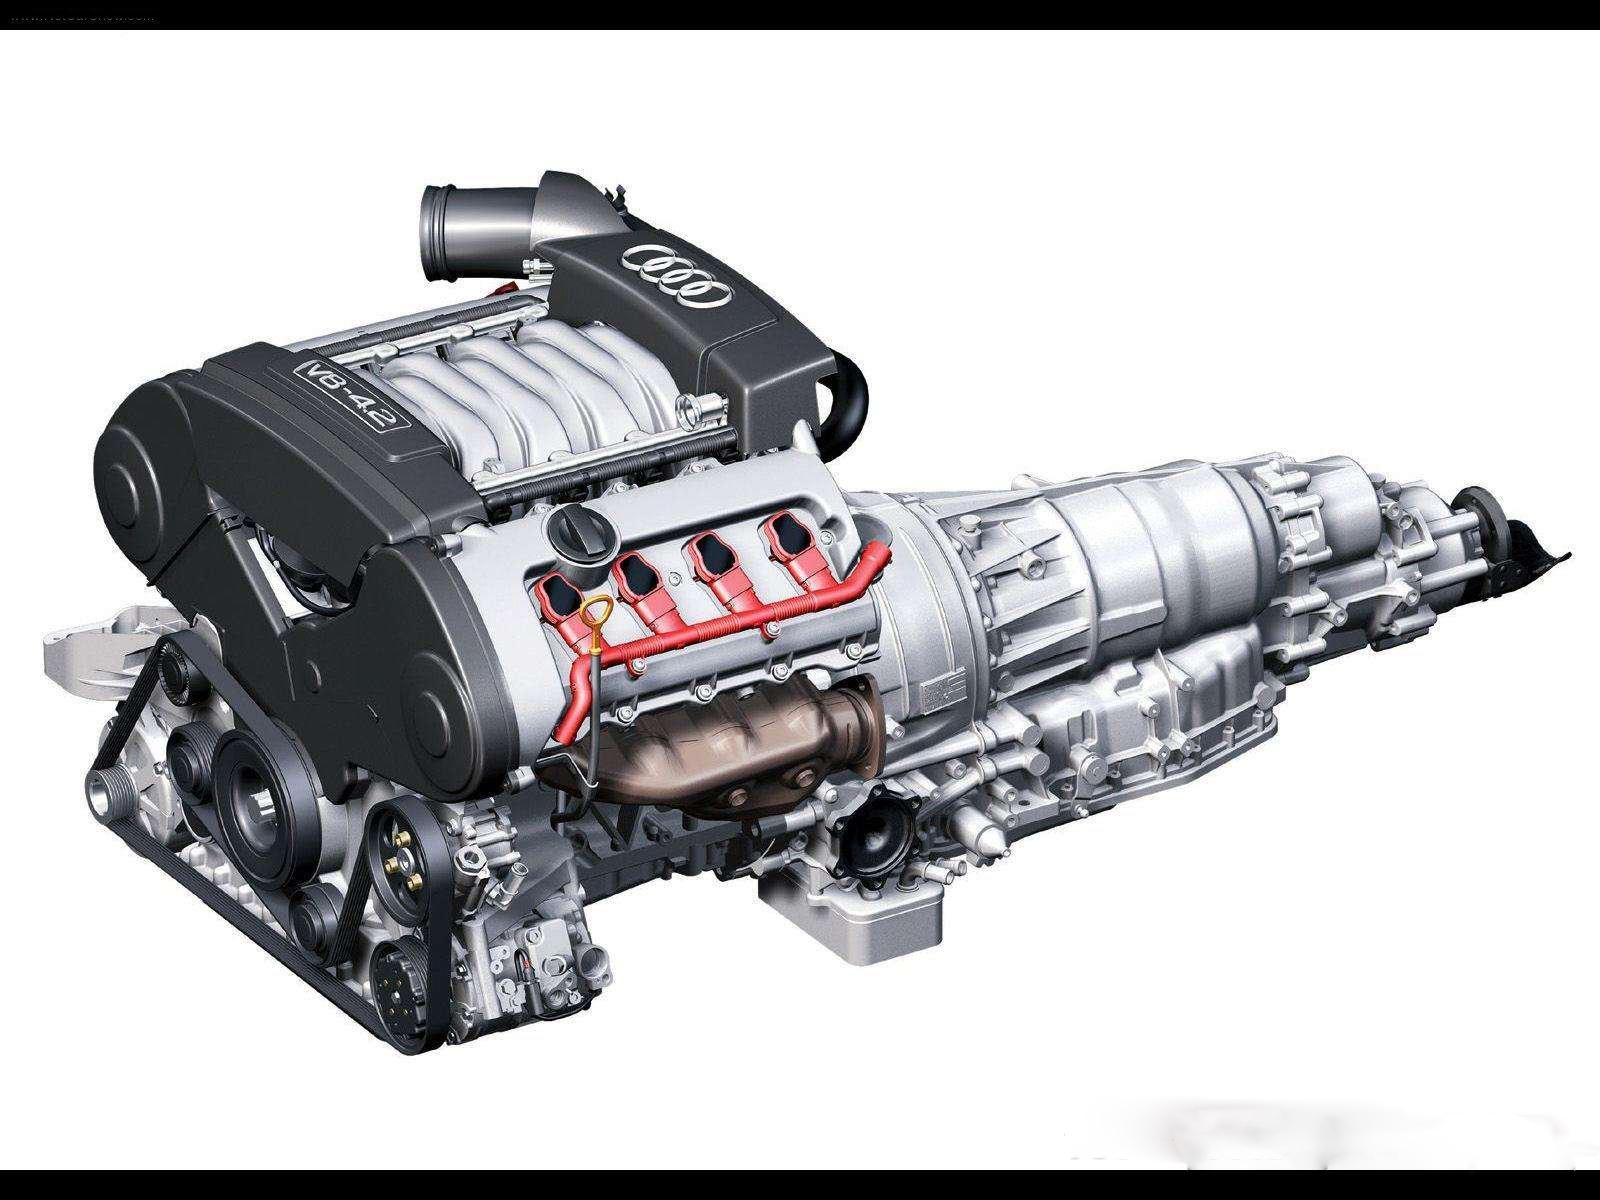 2002 ford mustang engine diagram chevy blazer radio wiring 4 2001